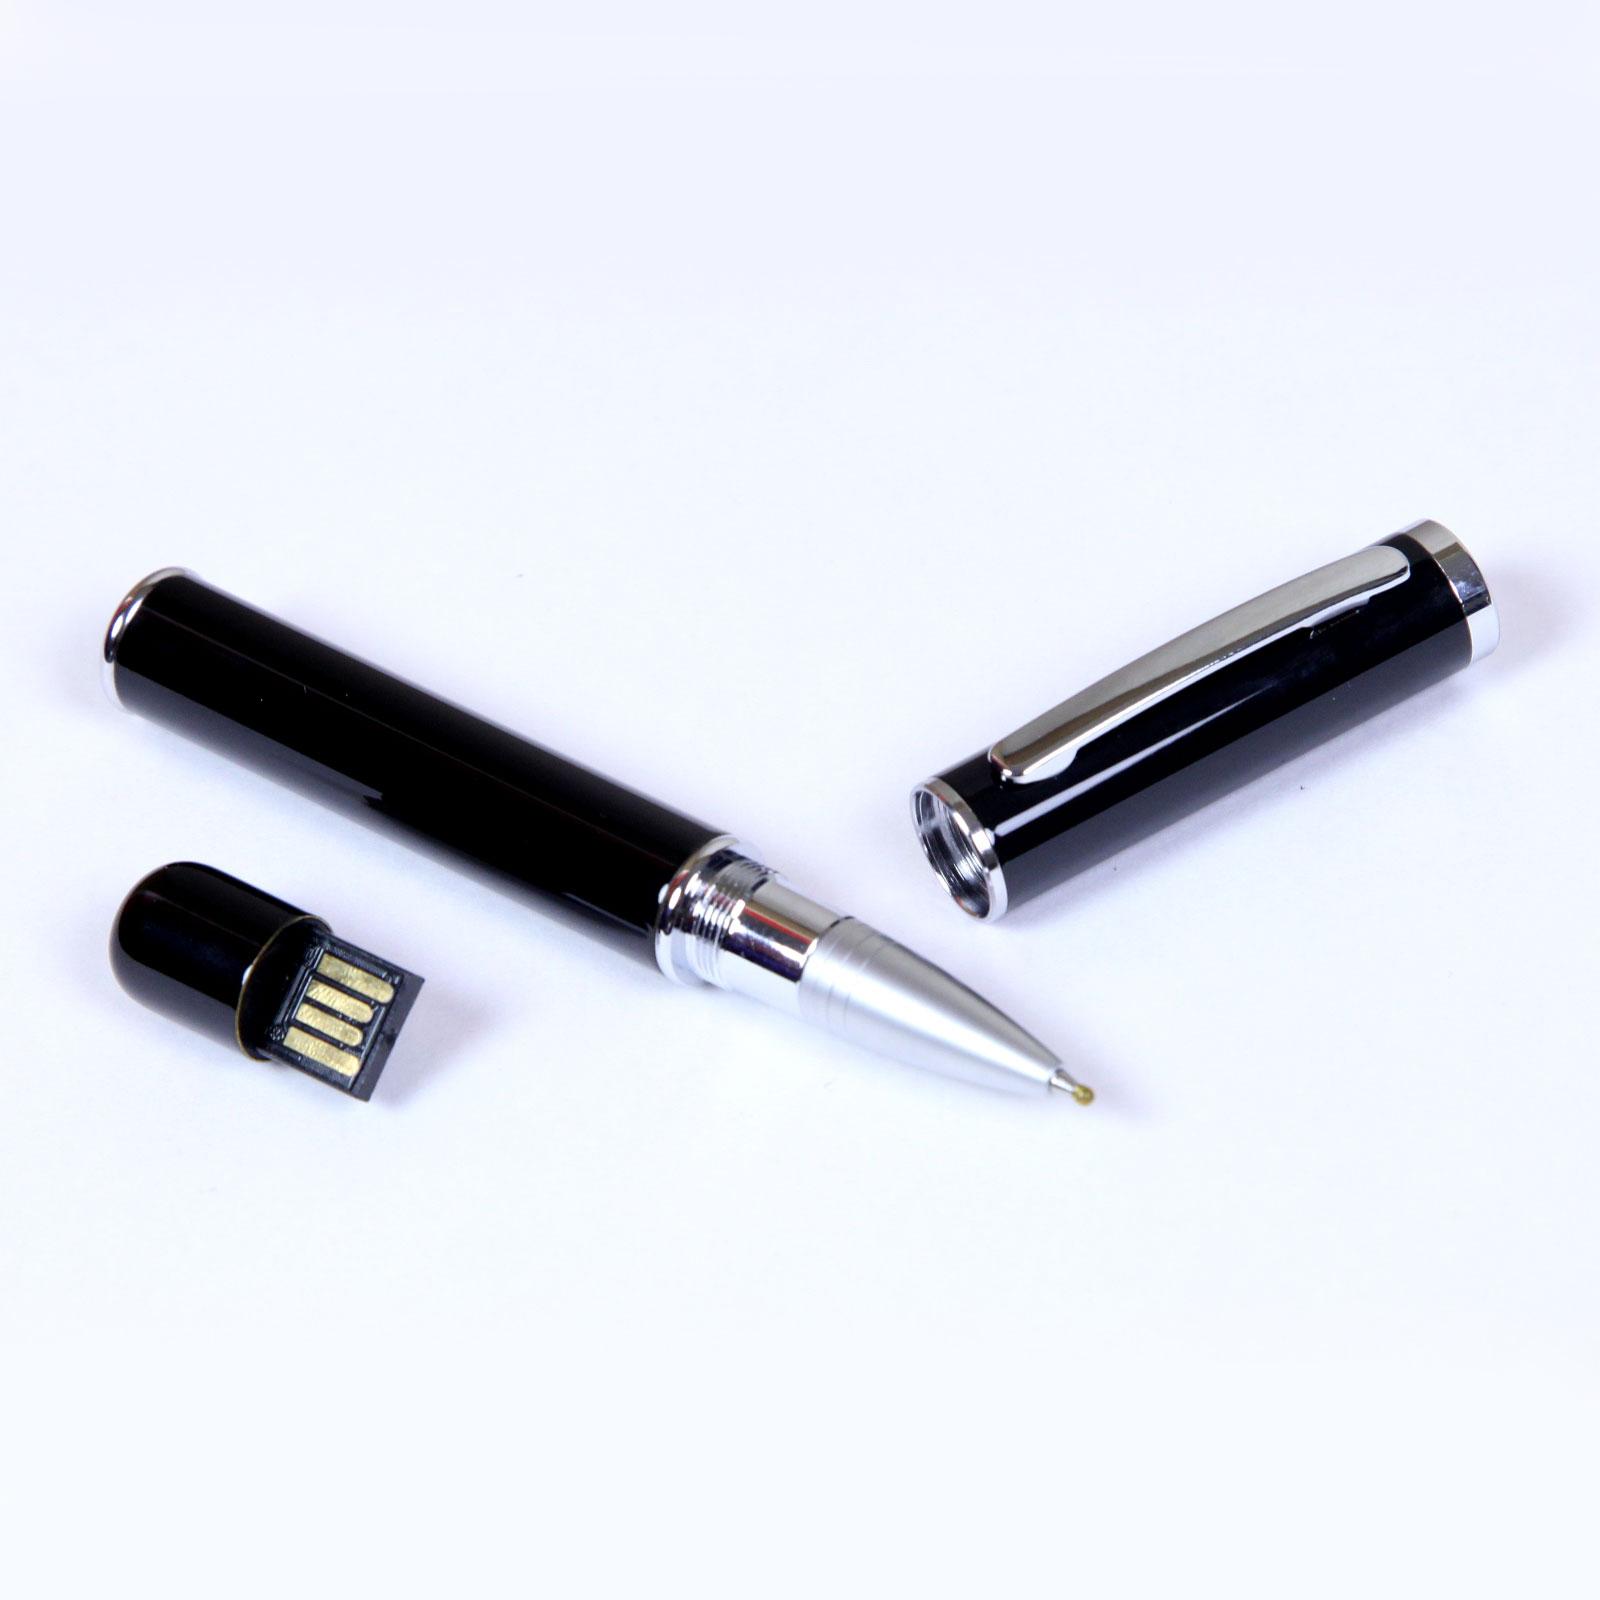 Флеш-накопитель в виде ручки с мини чипом